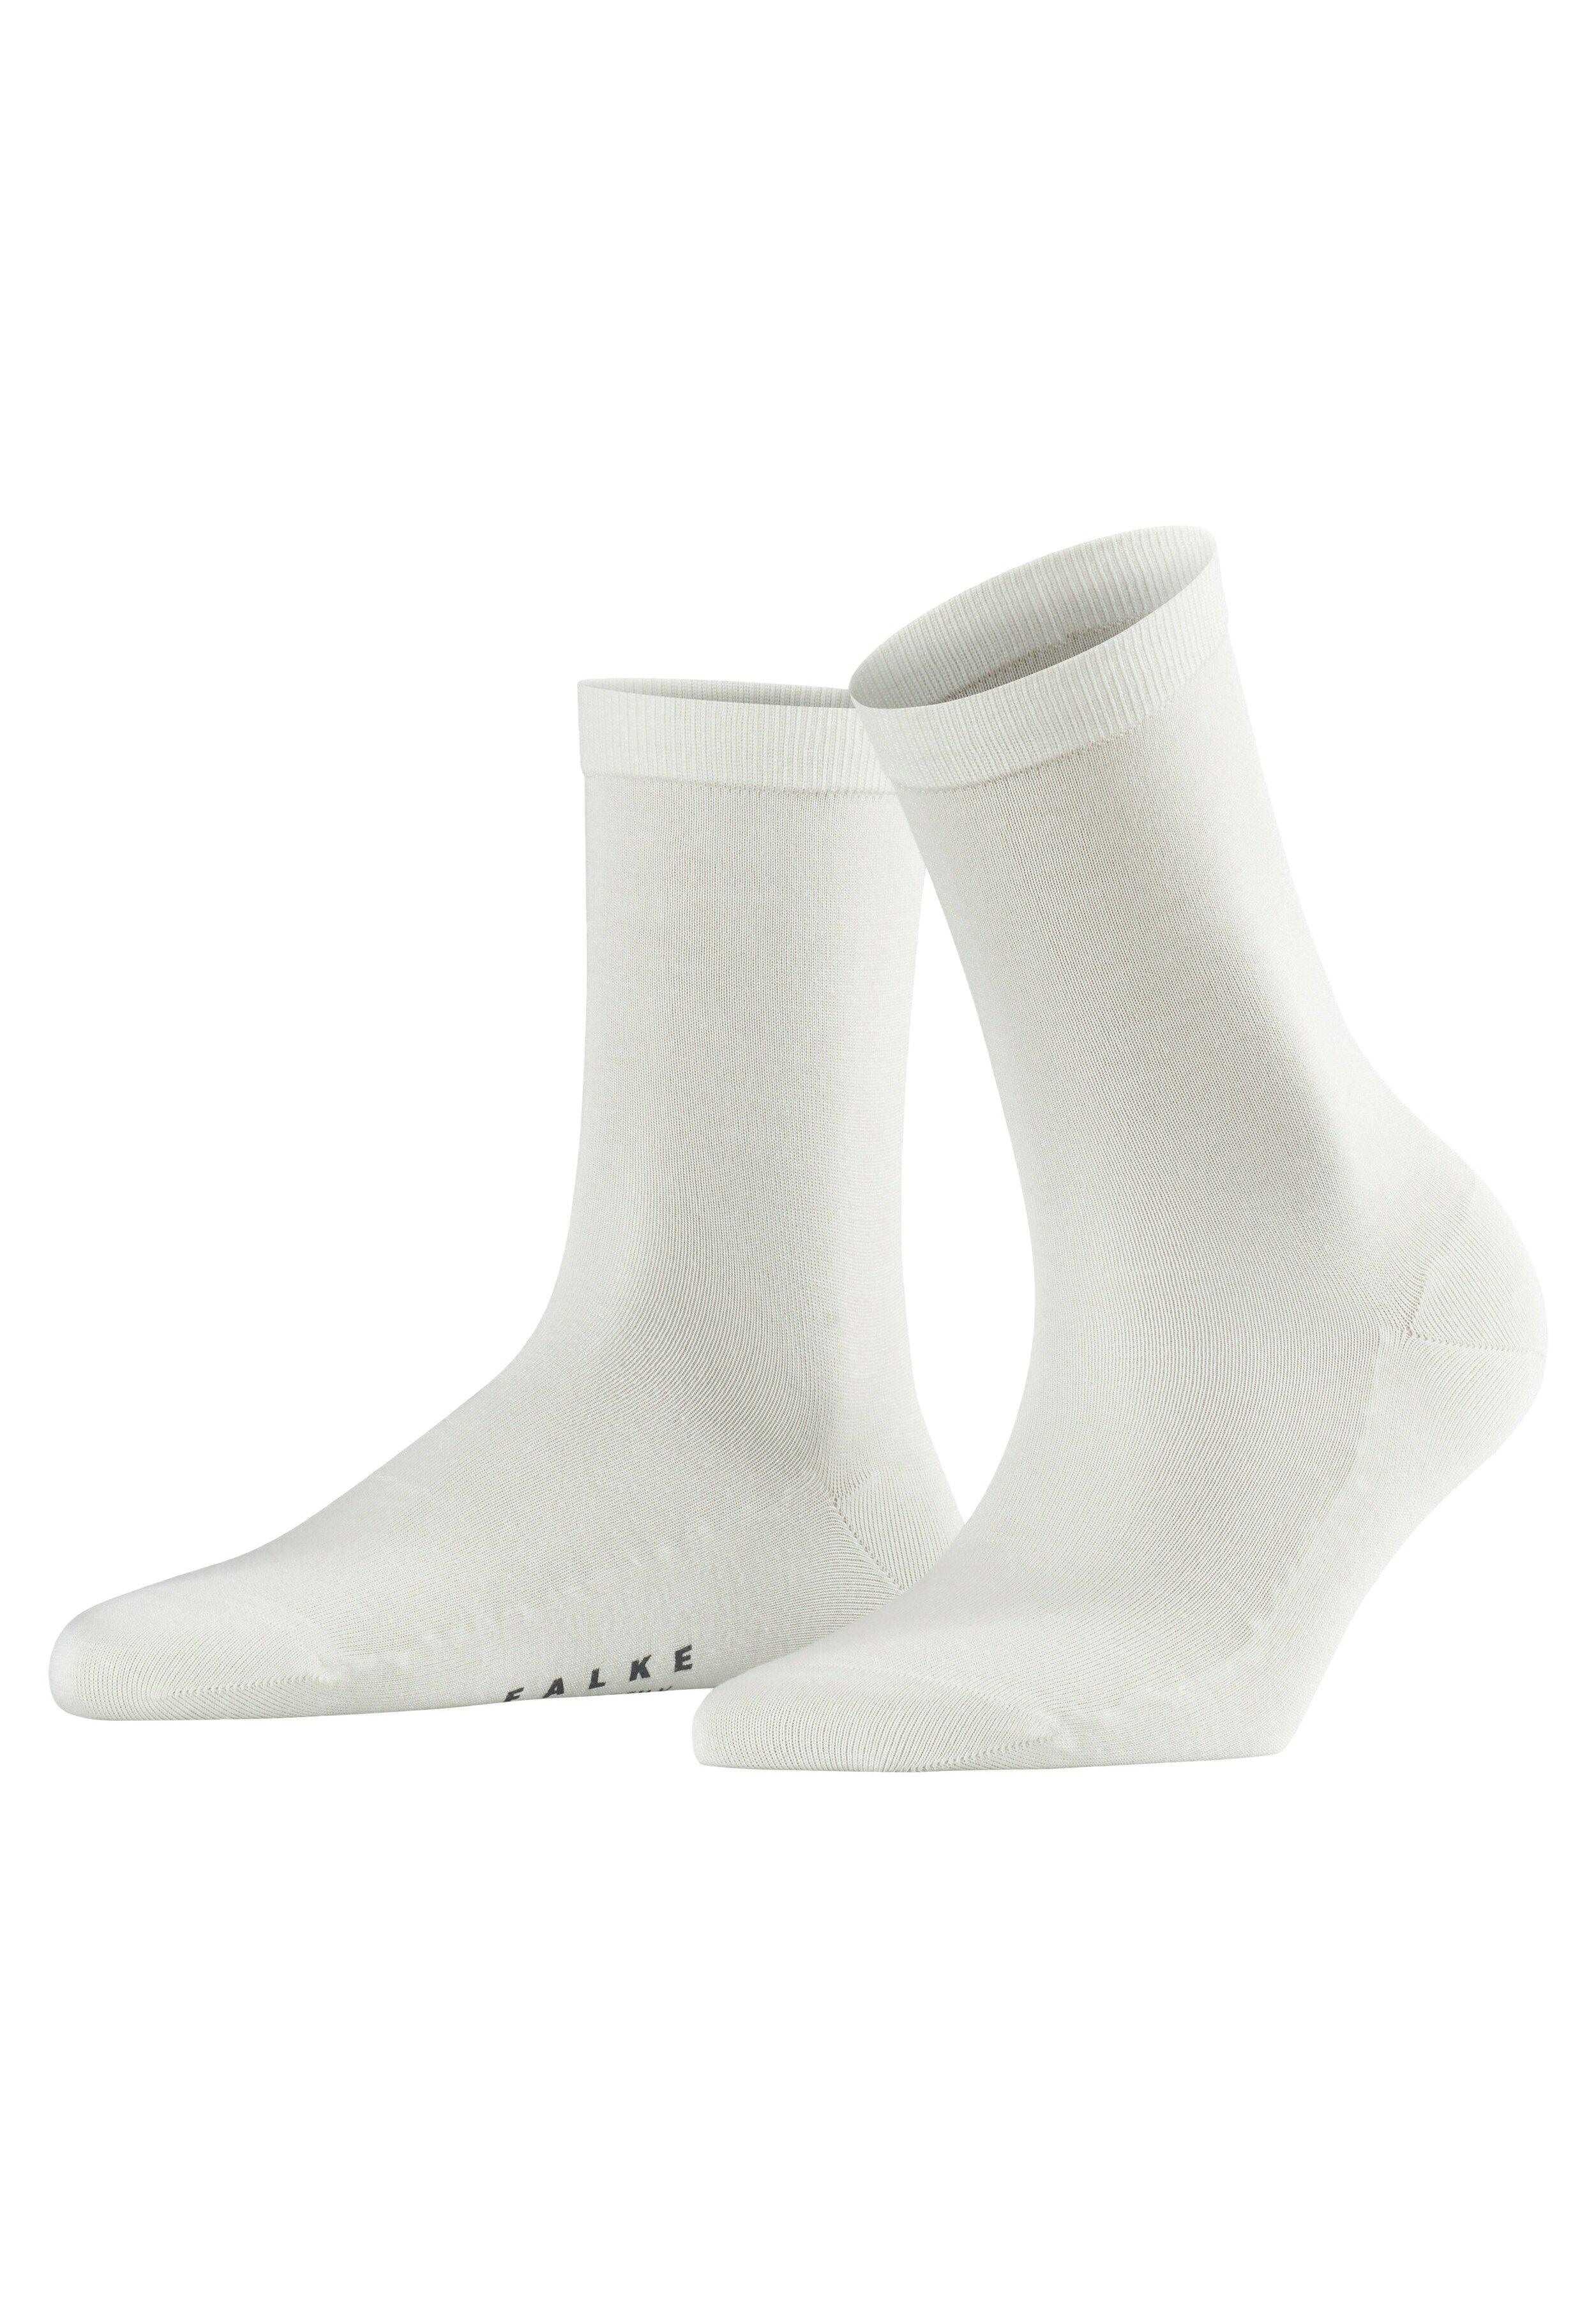 Femme 2 PACK SENSUAL SILK - Chaussettes de sport - off-white